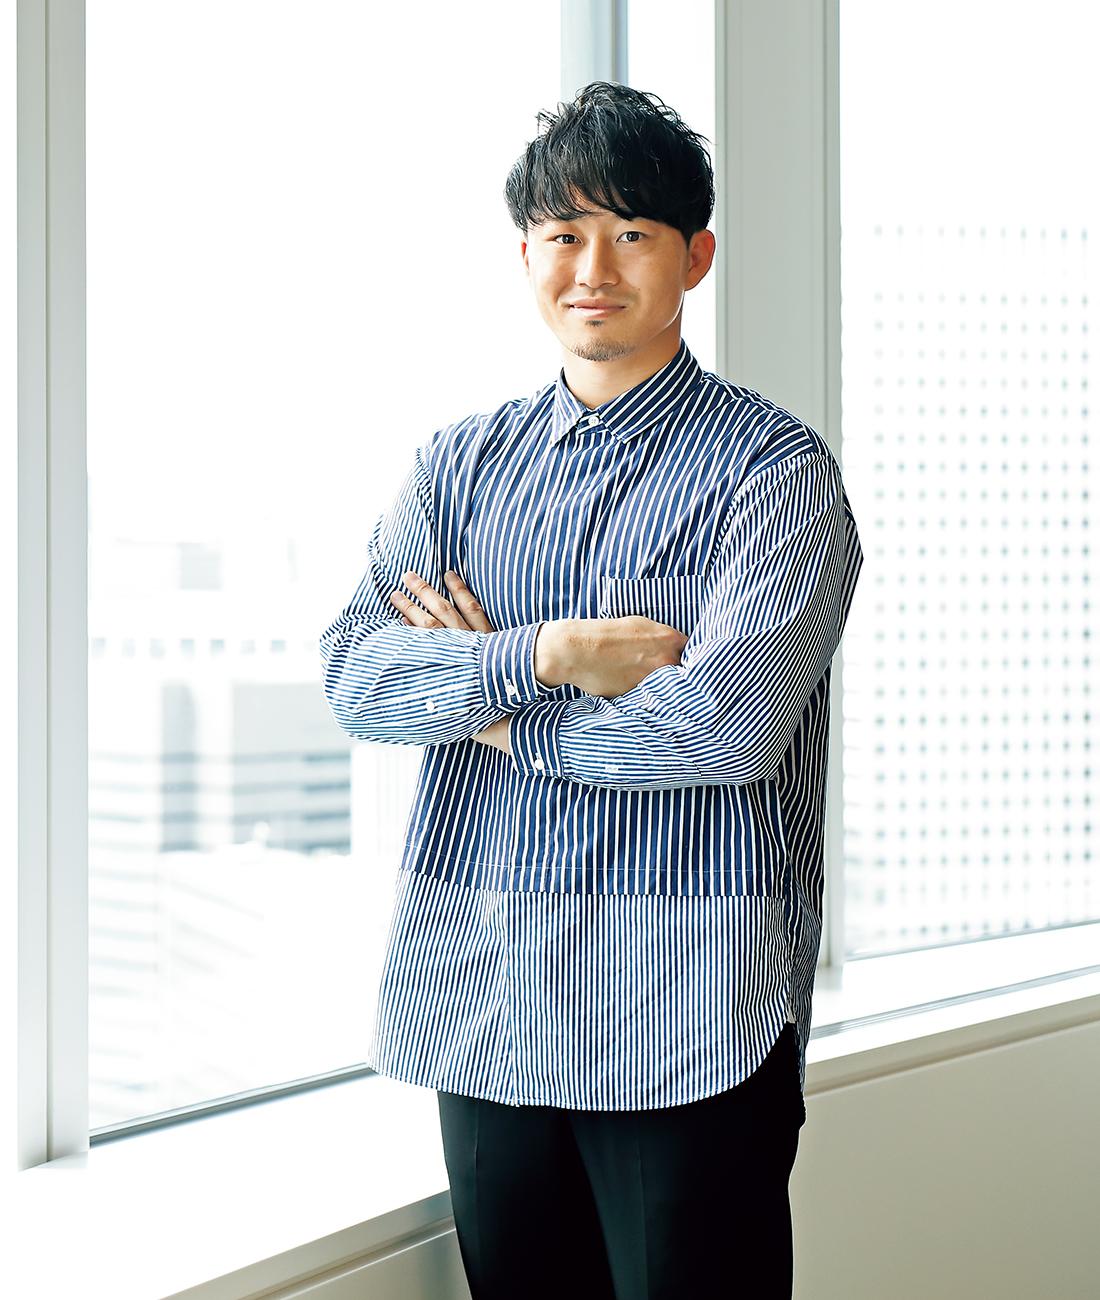 Shingo Maeda